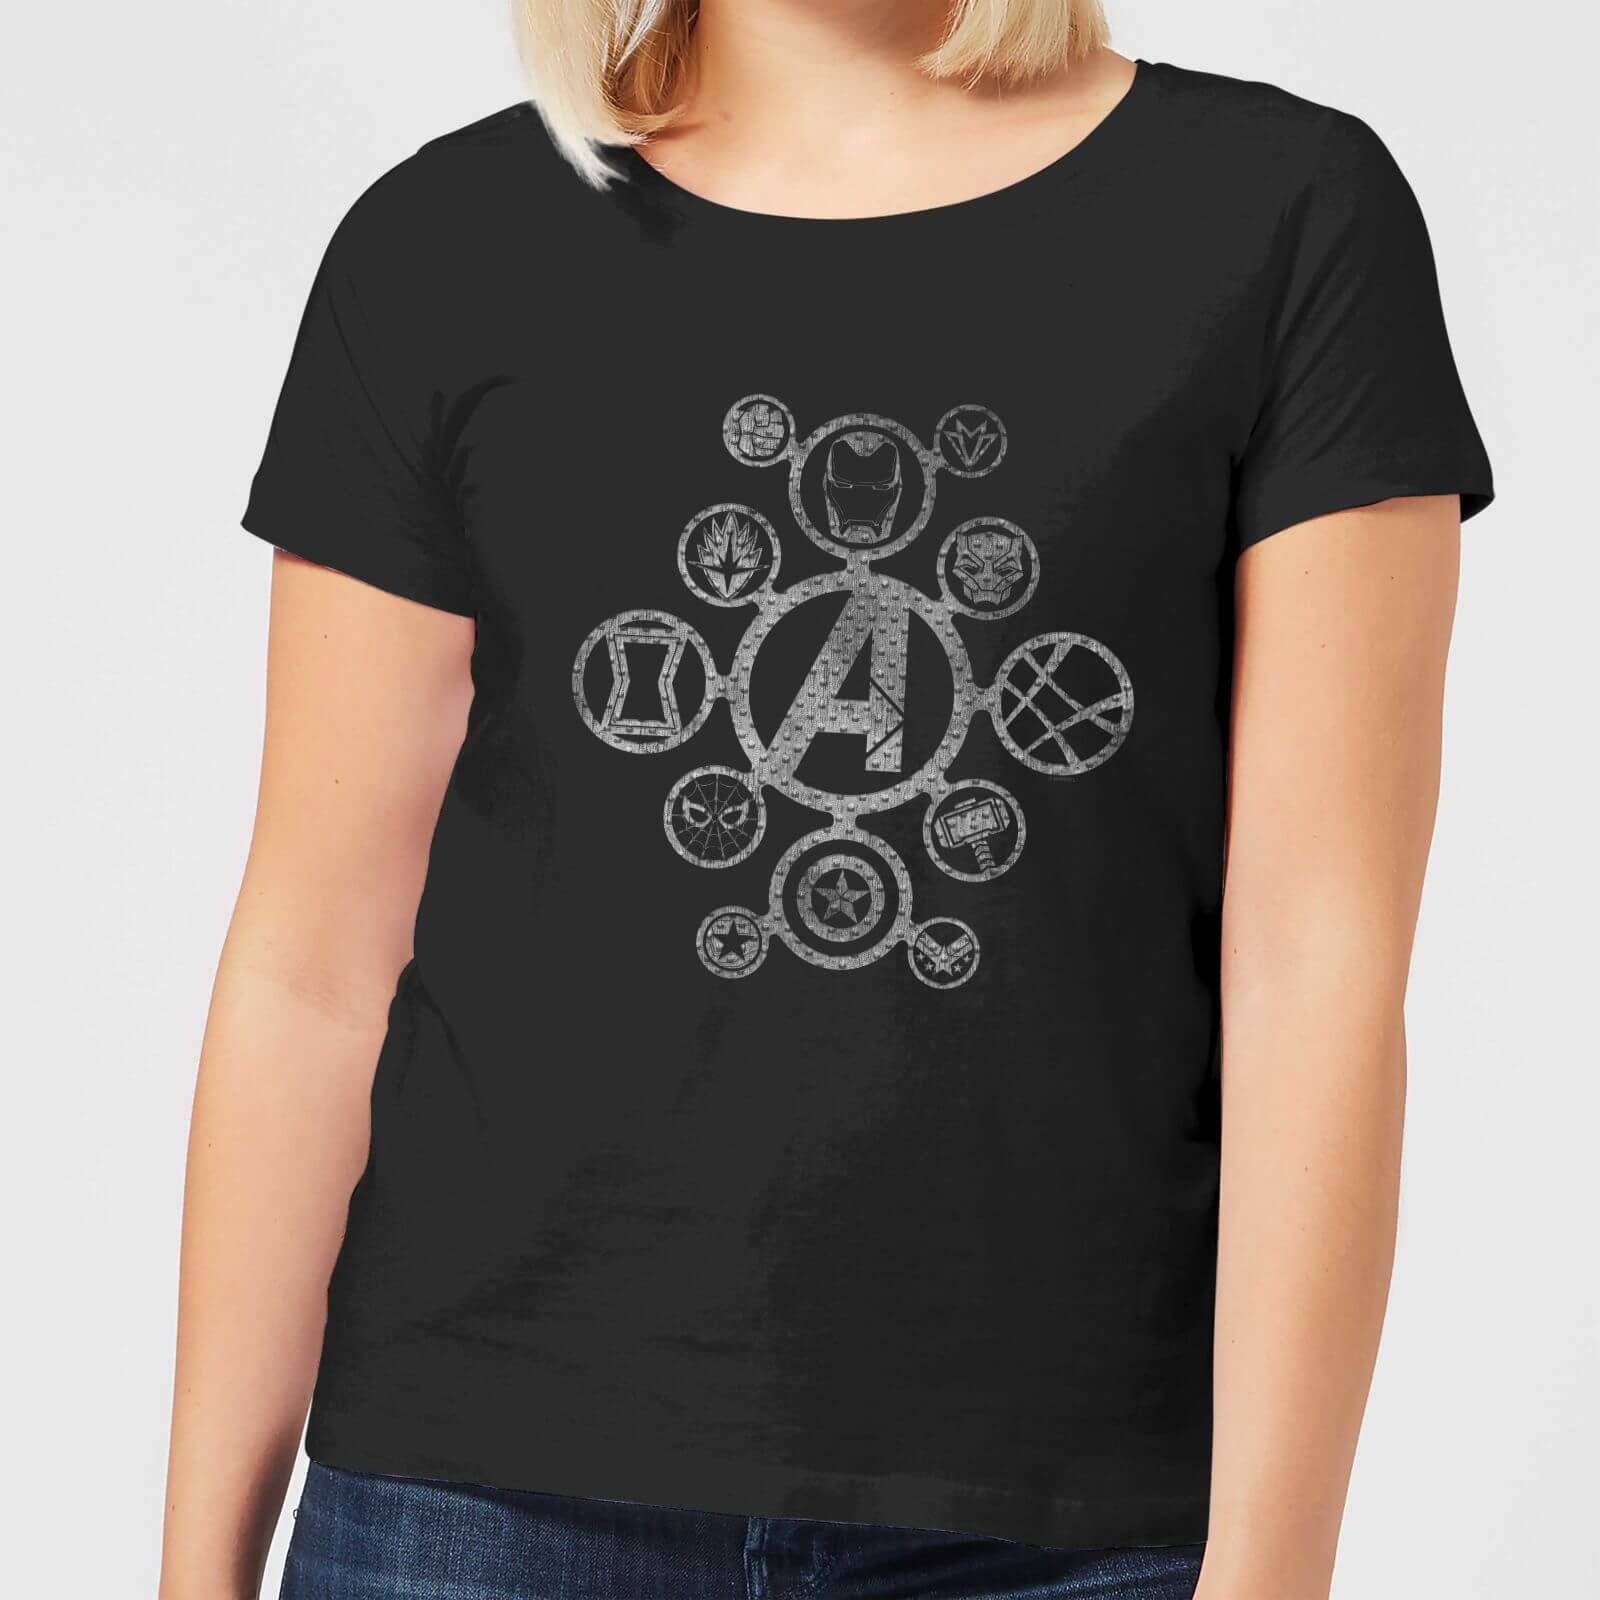 Marvel Avengers Distressed Metal Icon Women's T-Shirt - Black - XL - Black